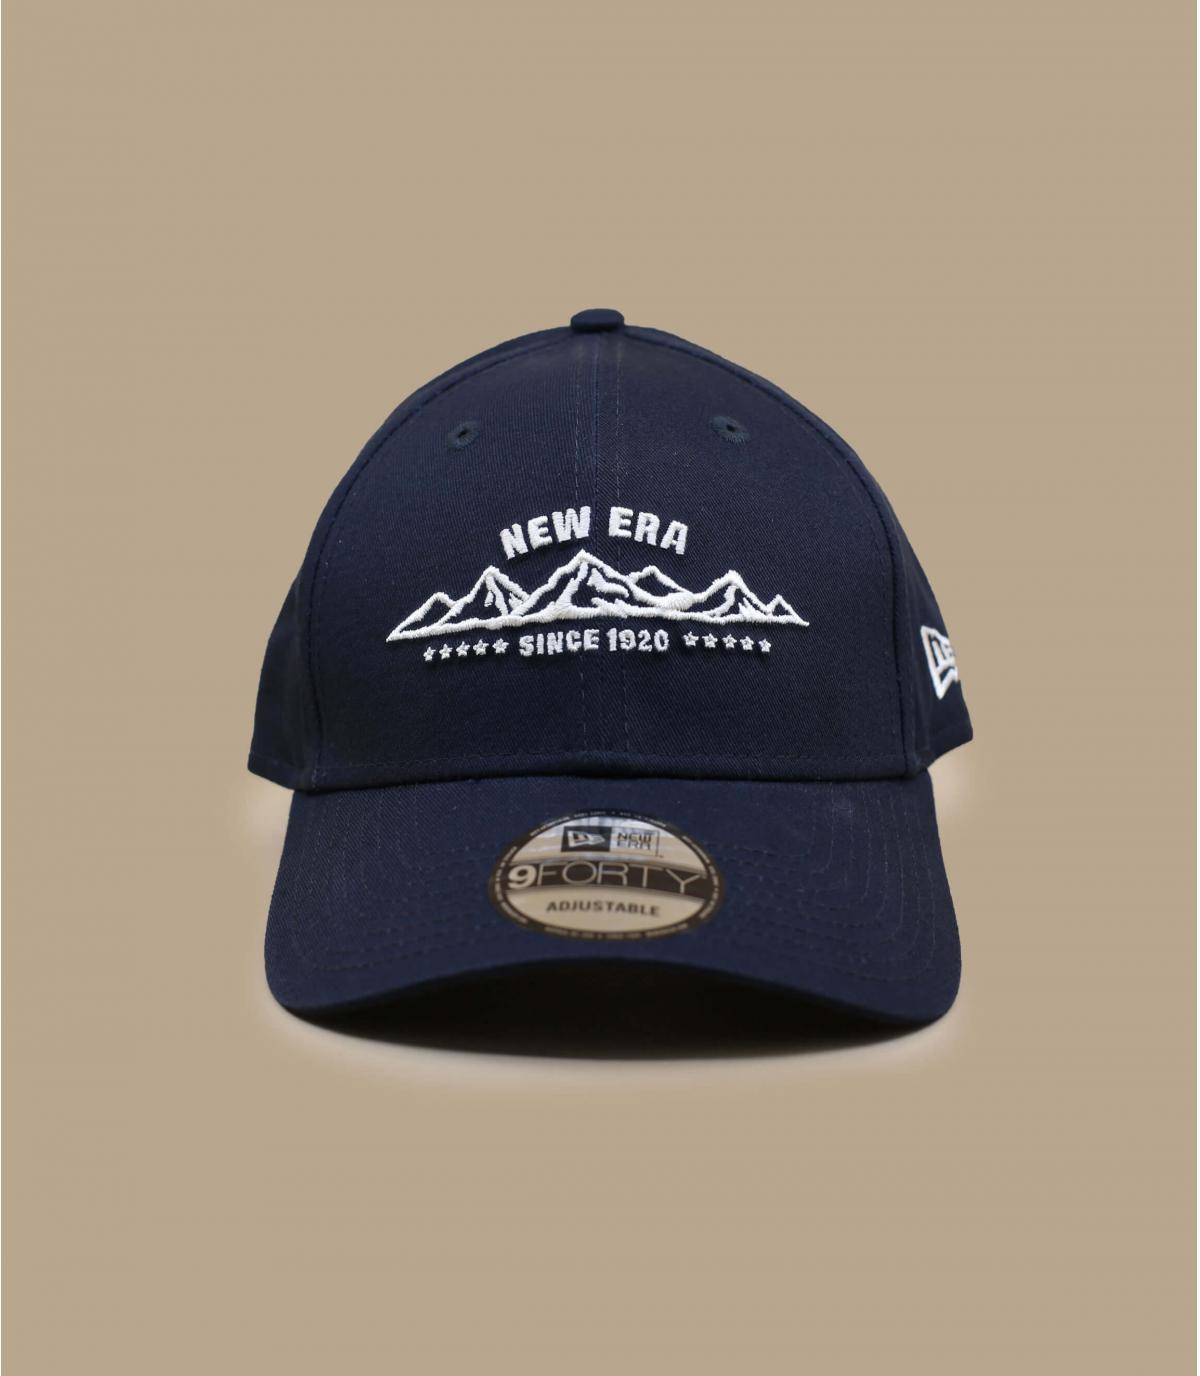 casquette New Era montagne